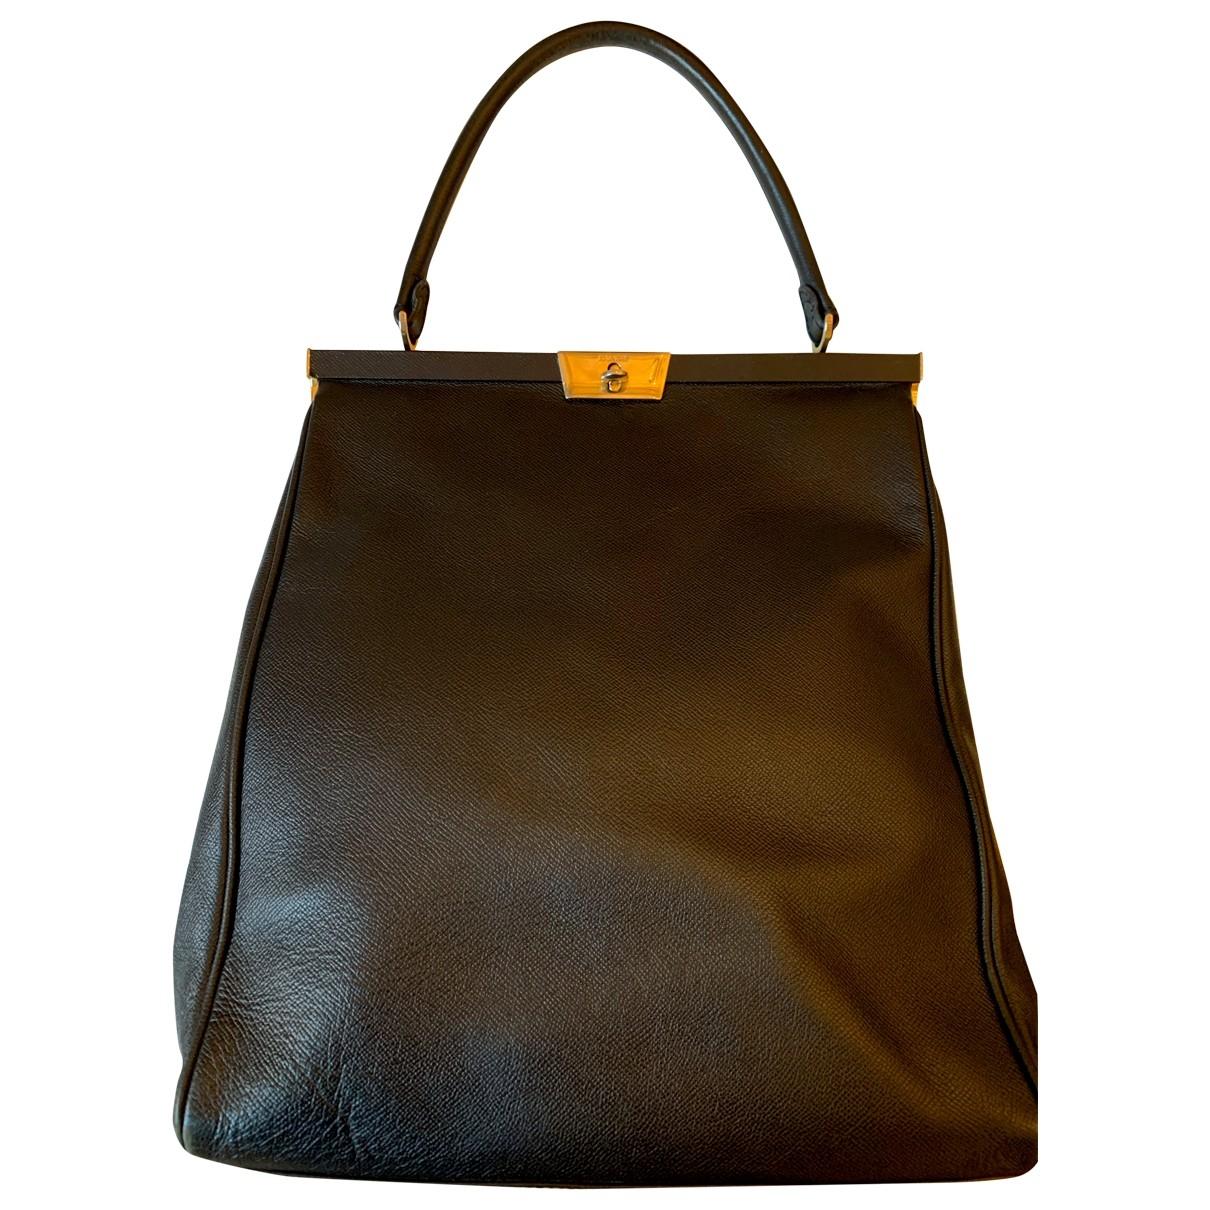 Jil Sander \N Black Leather handbag for Women \N